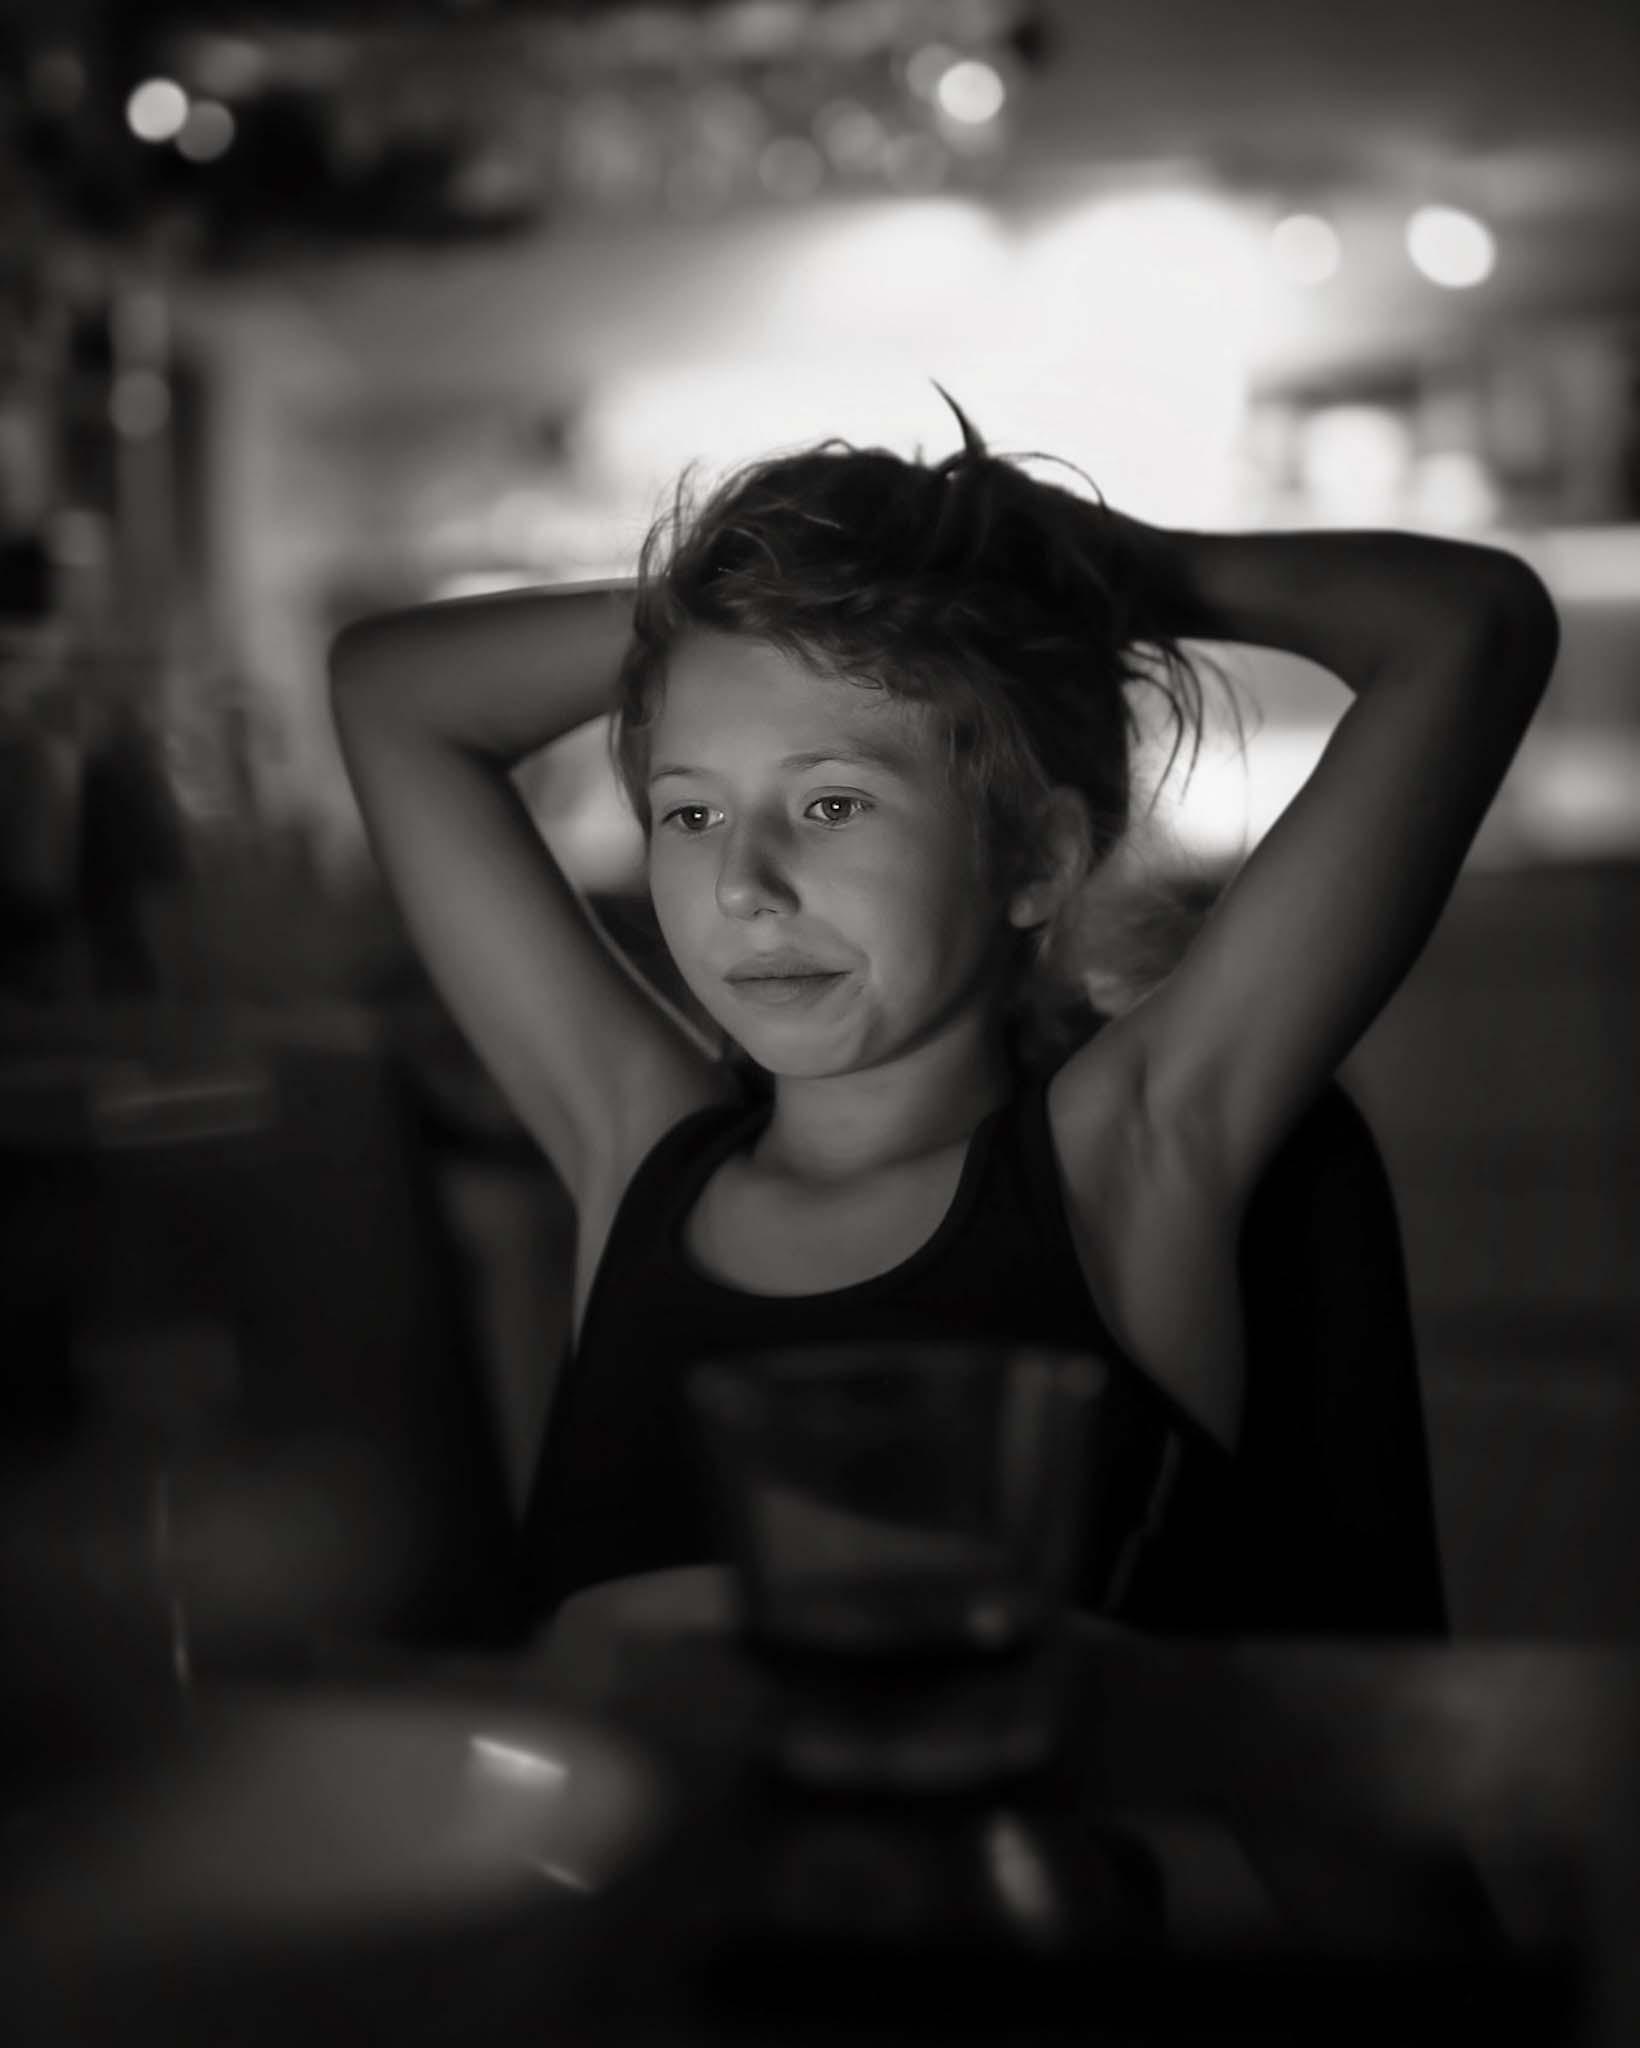 svartvitt porträttfoto